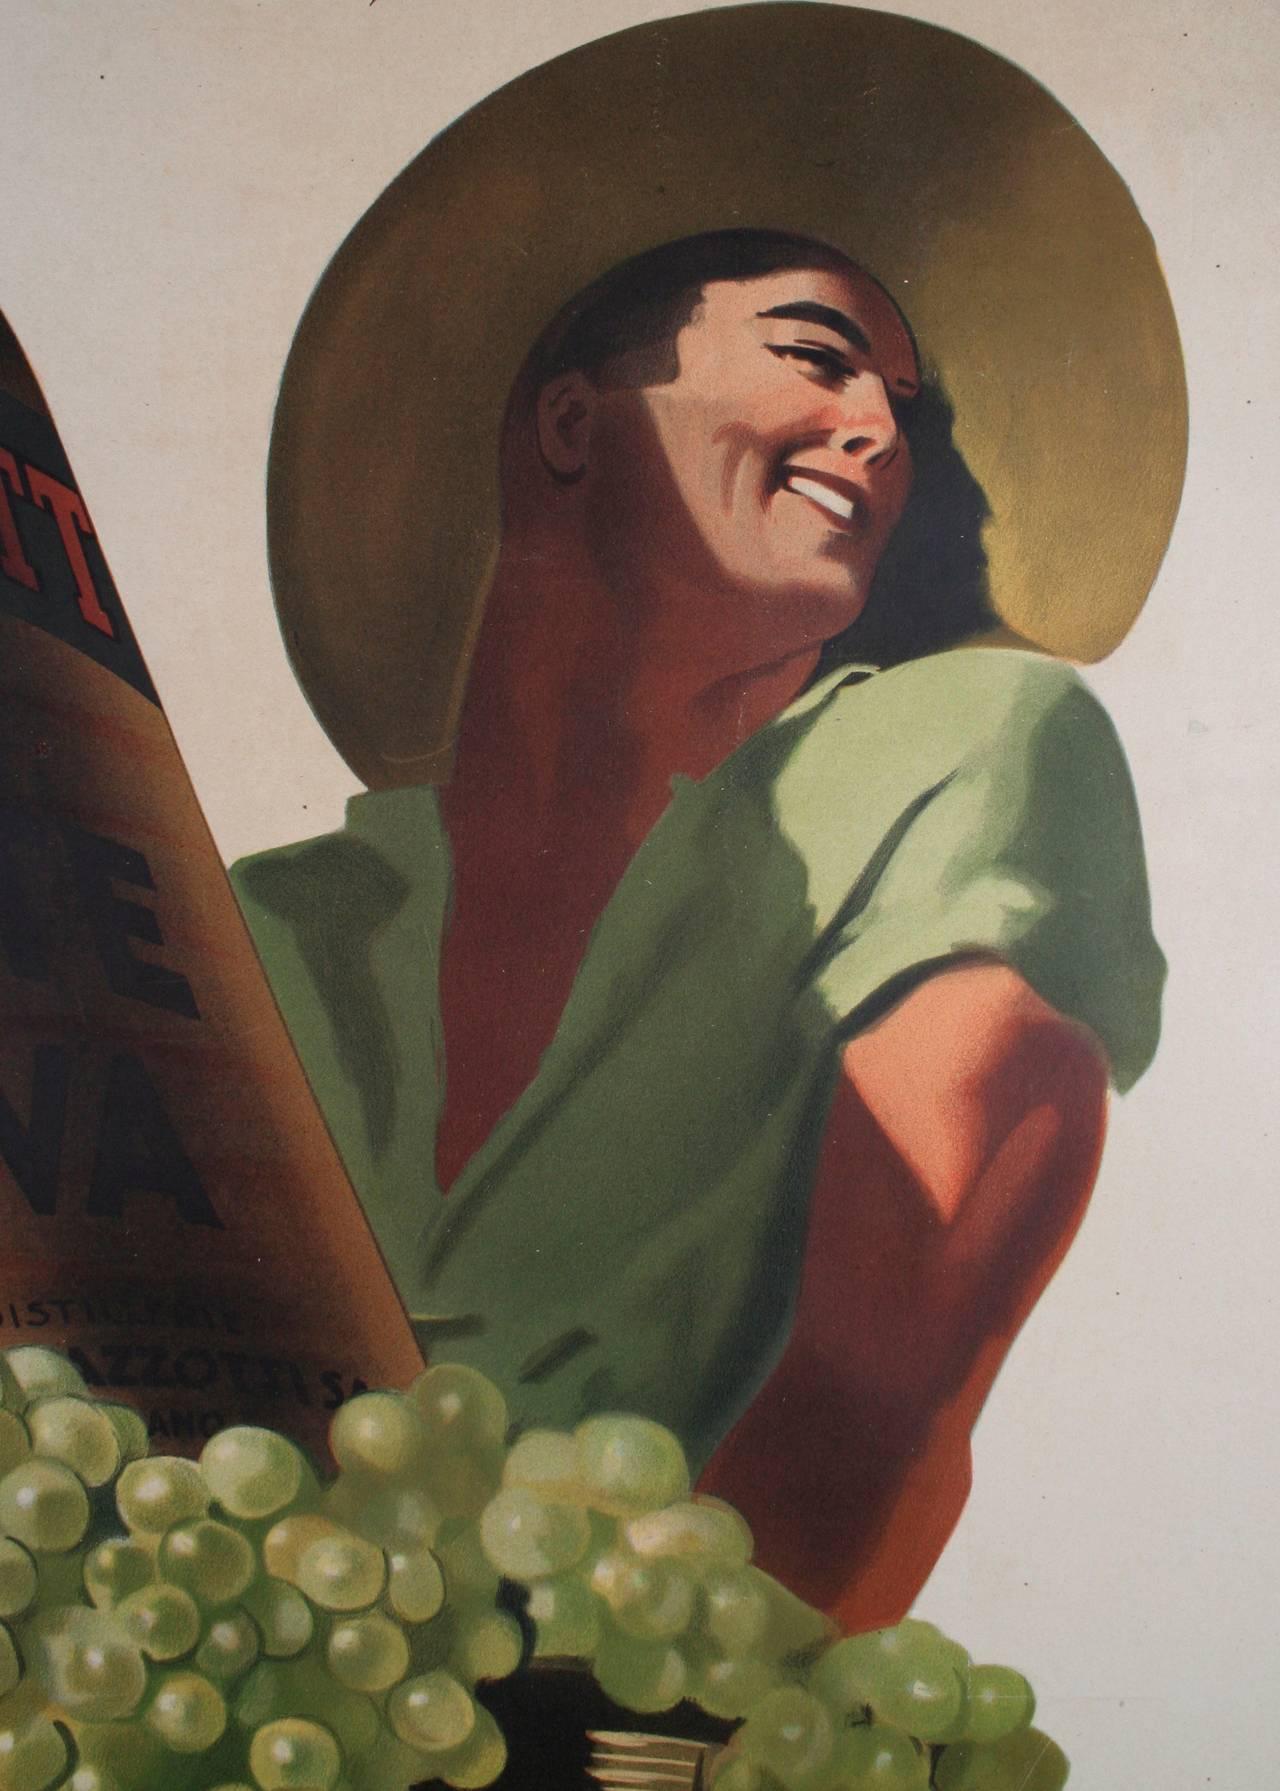 Large Italian Liquor Poster by Gino Boccasile, circa 1940 3